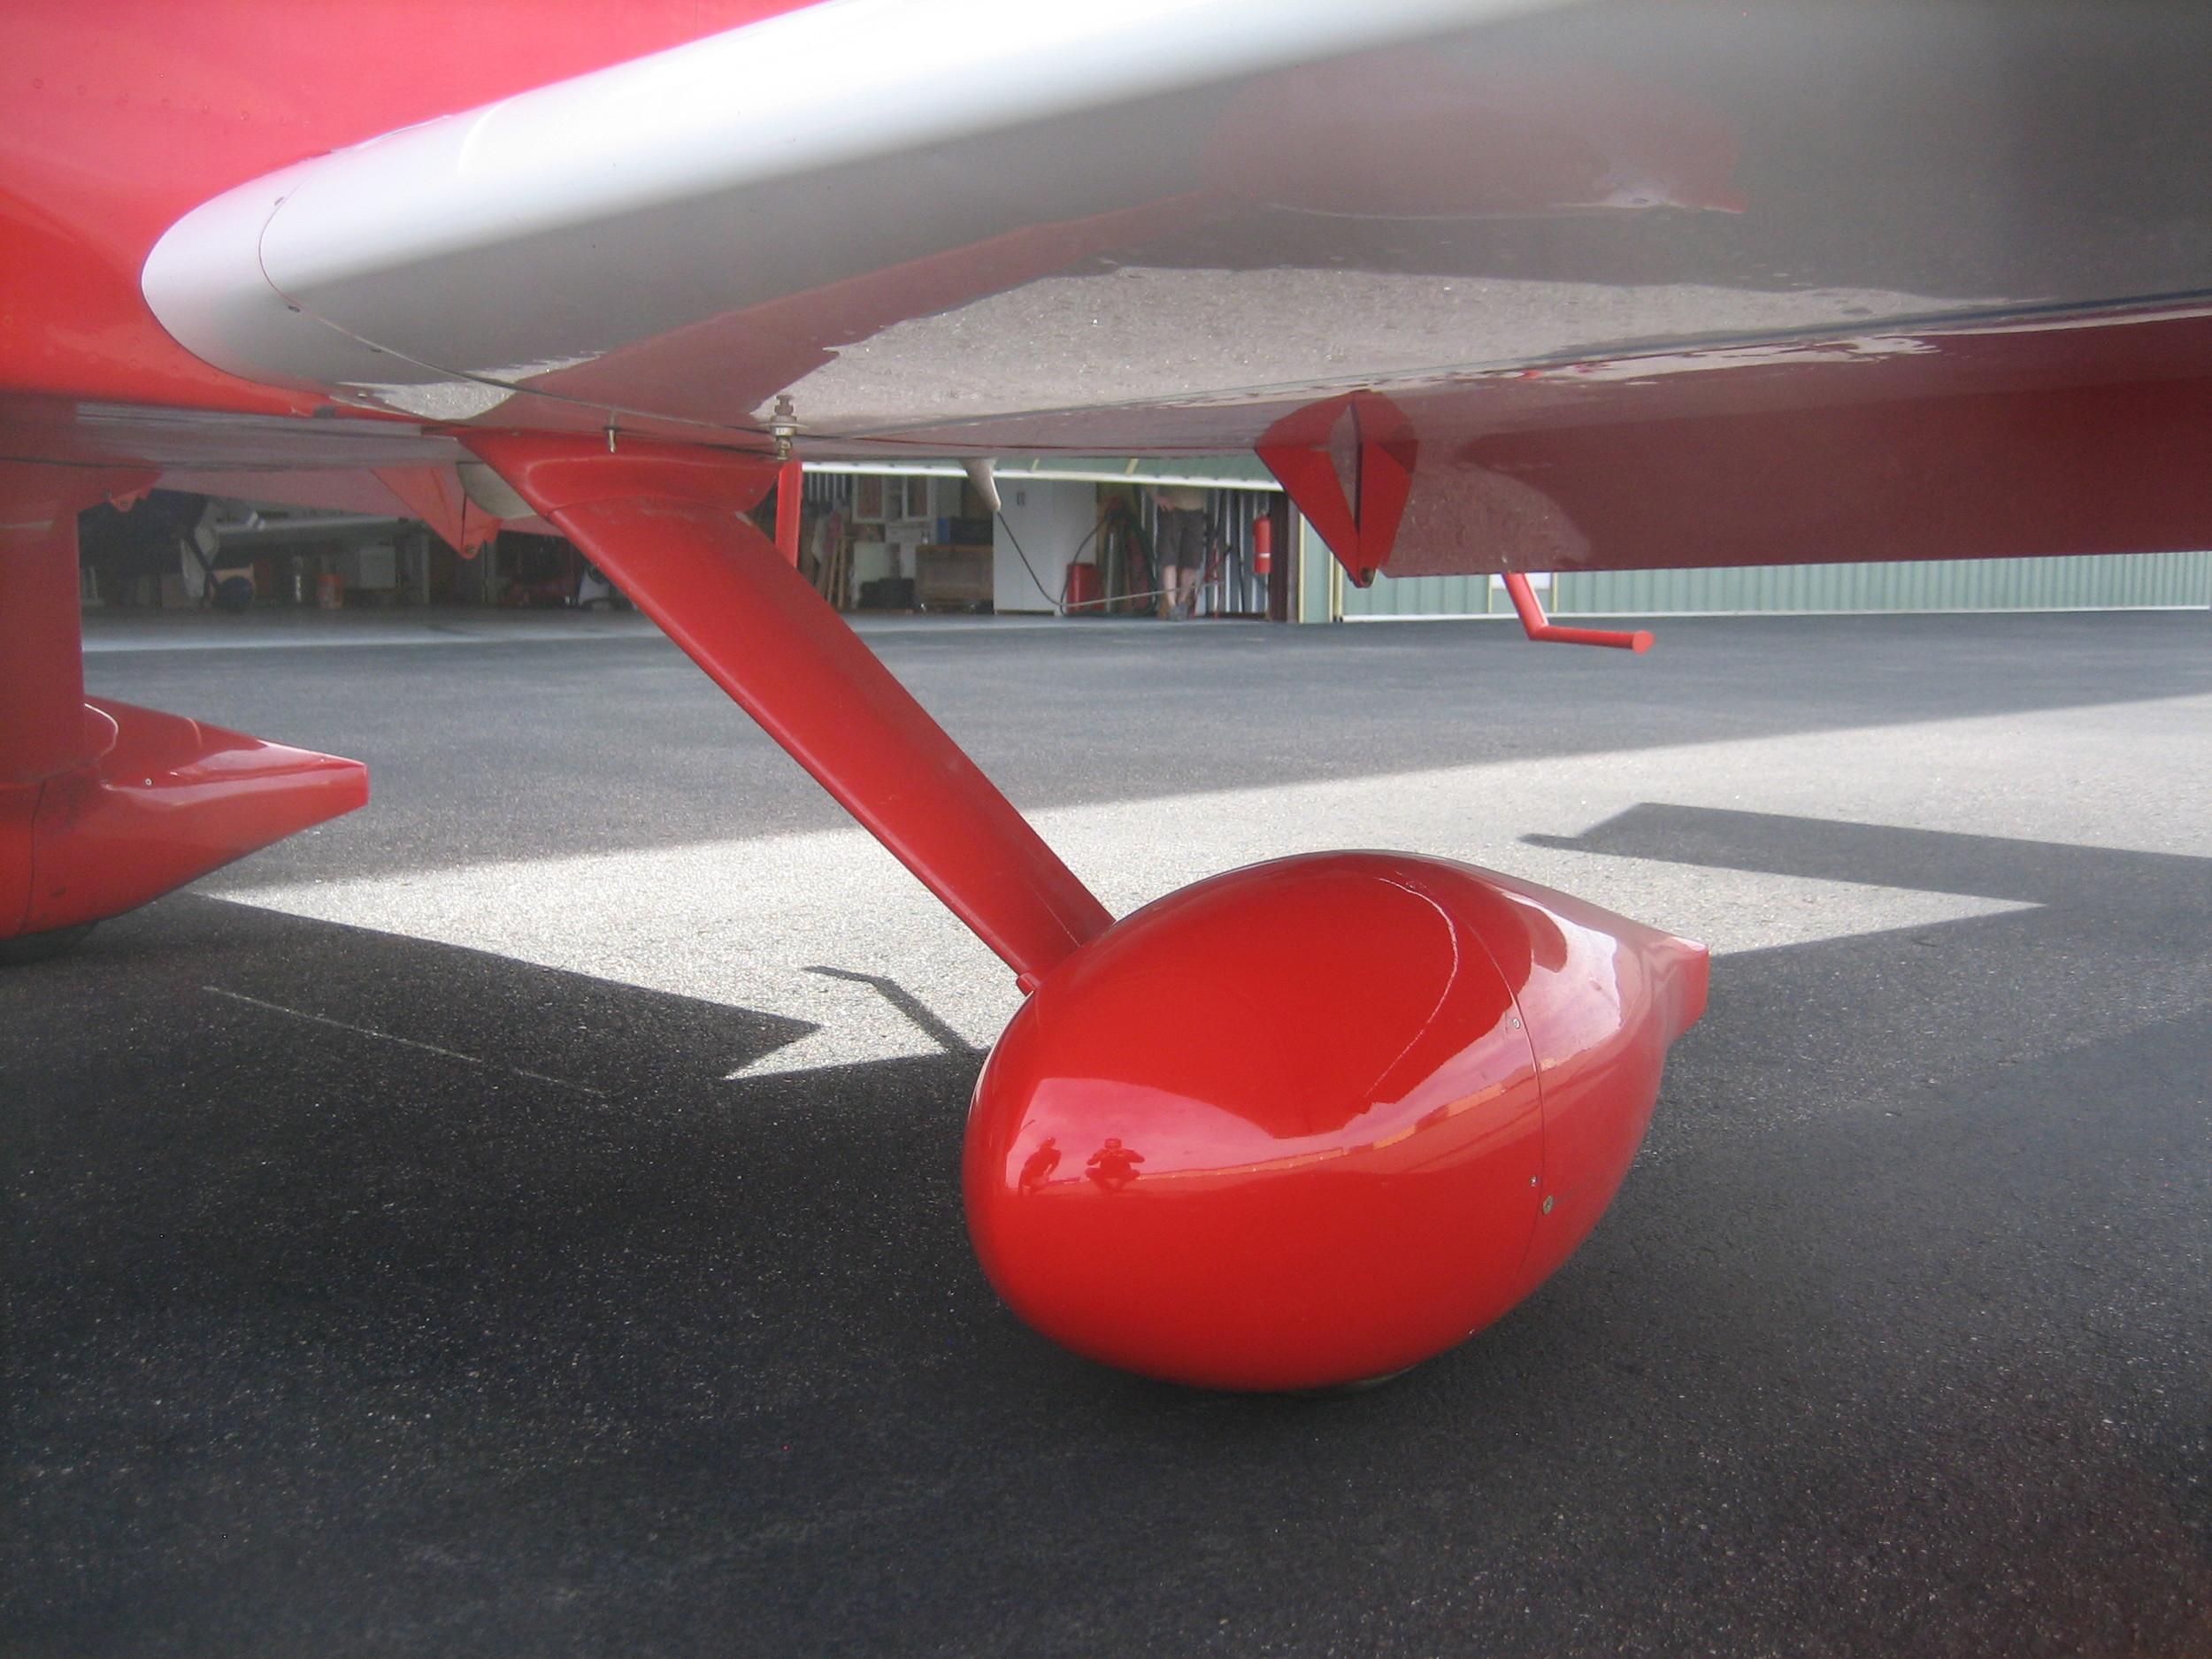 RV-10 Dnever 012.JPG